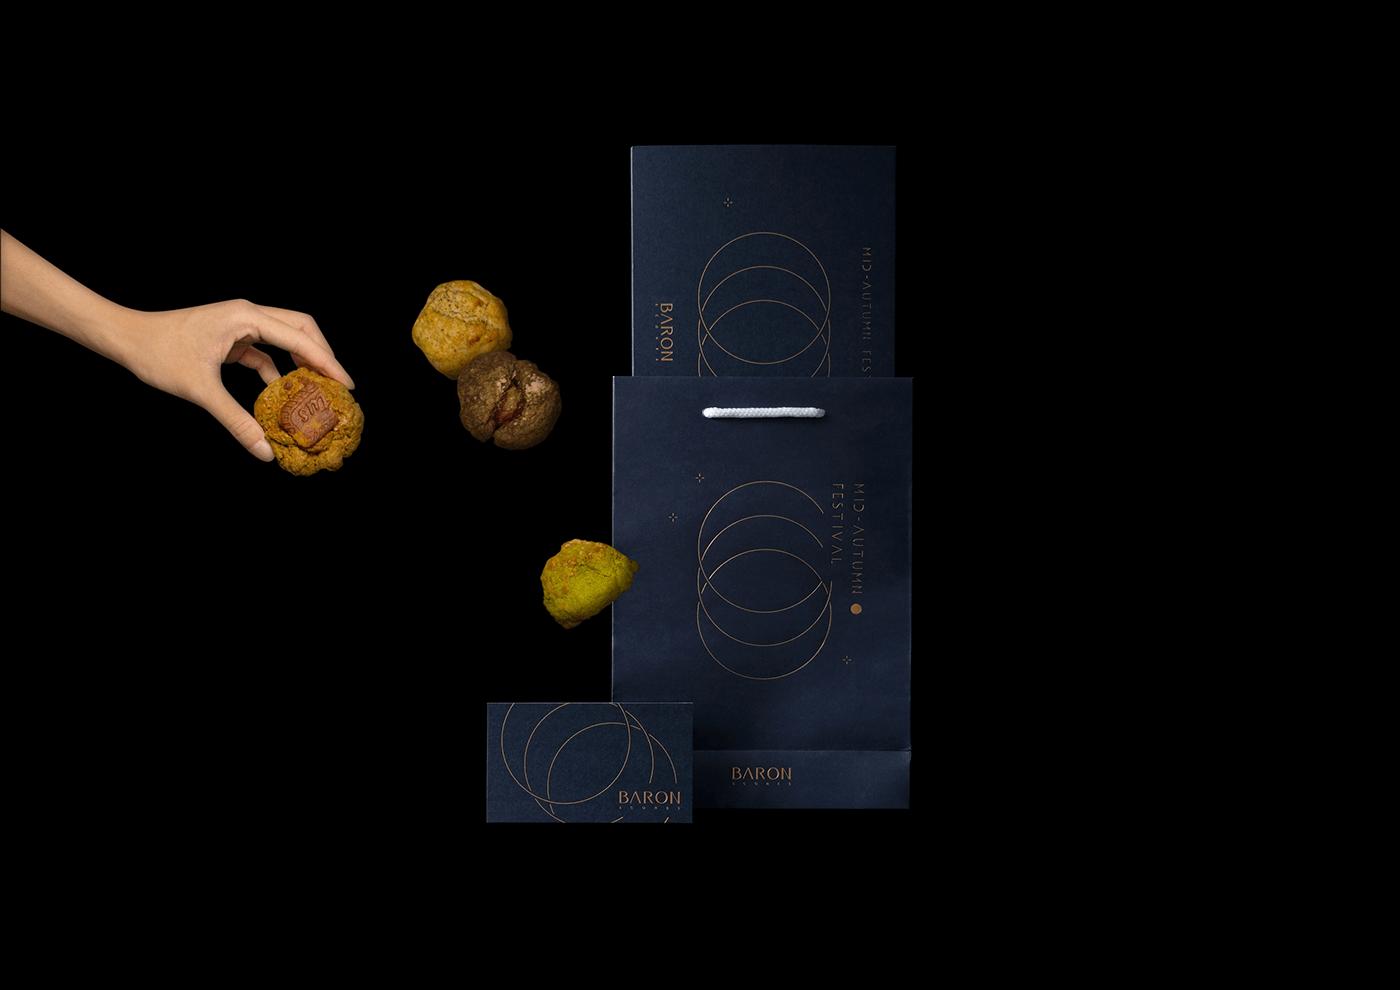 blue grapgic Mooon package scones taiwan 中秋  包裝設計 平面設計 禮盒